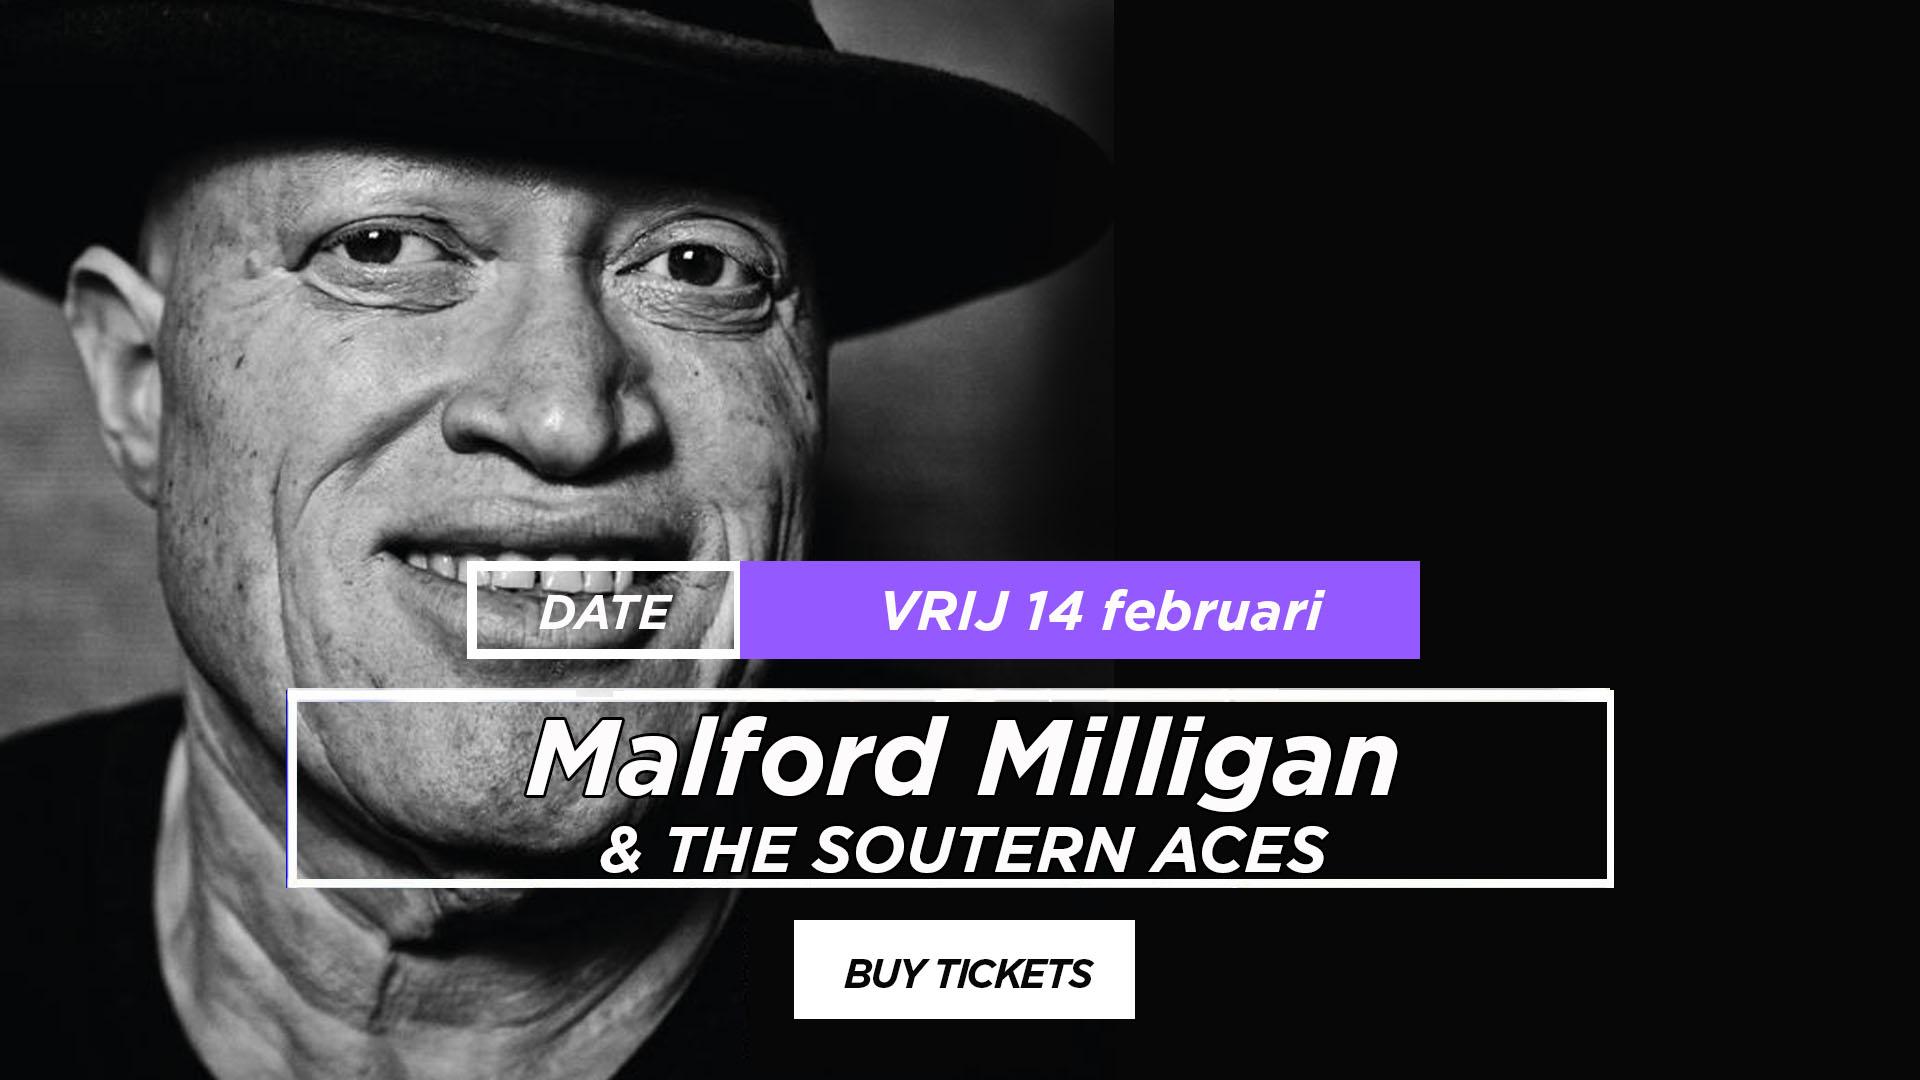 Malford Milligan